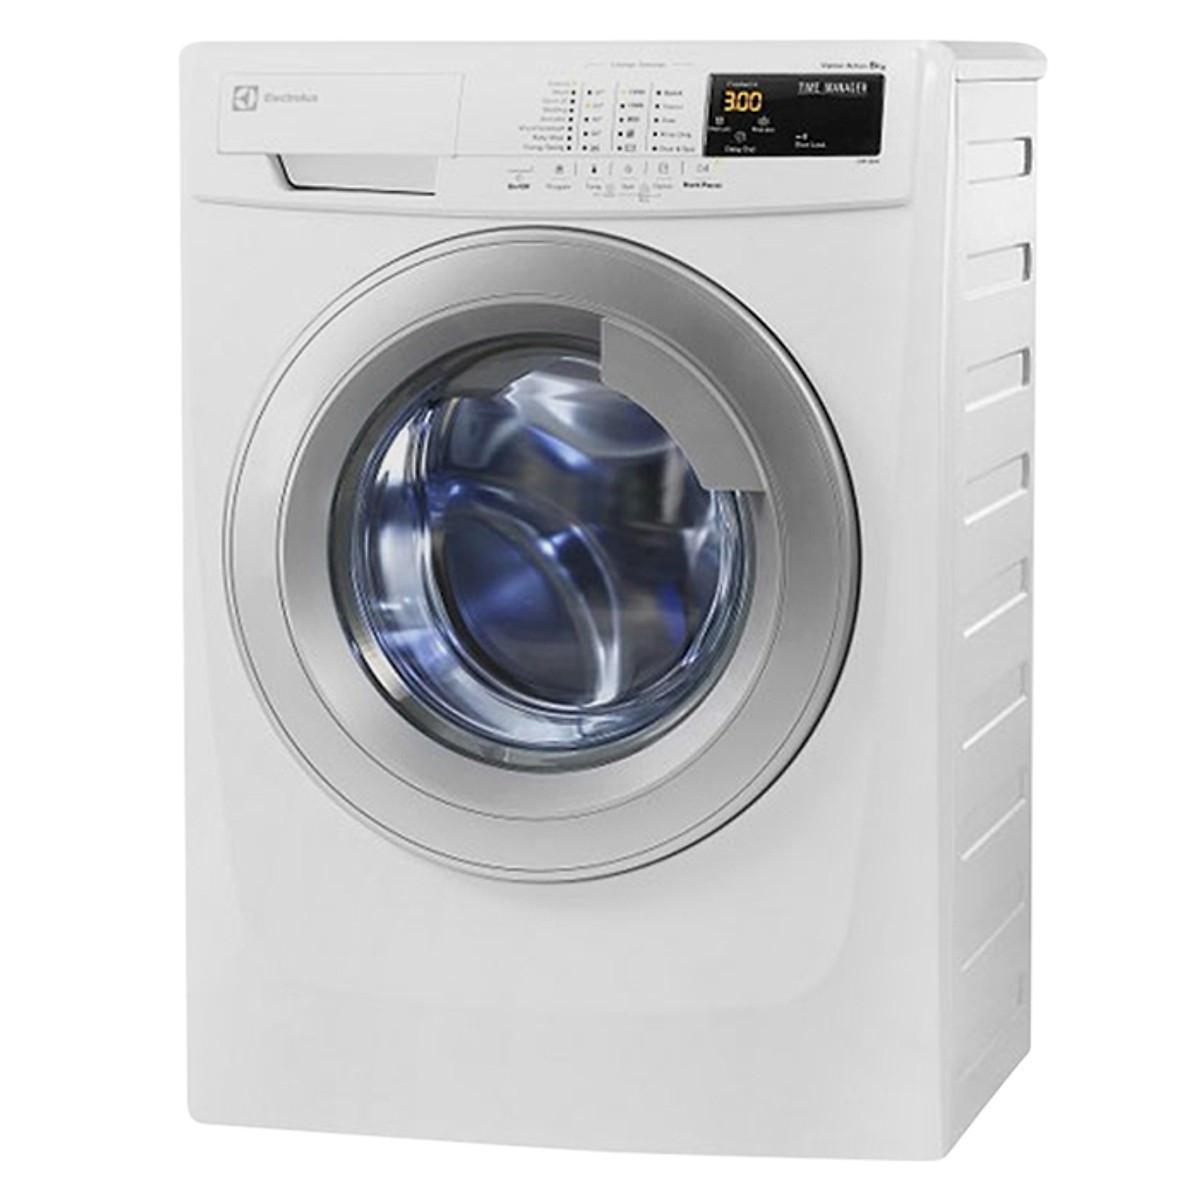 Review Máy Giặt Cửa Ngang Inverter Electrolux EWF10844 (8.0kg) - Trắng